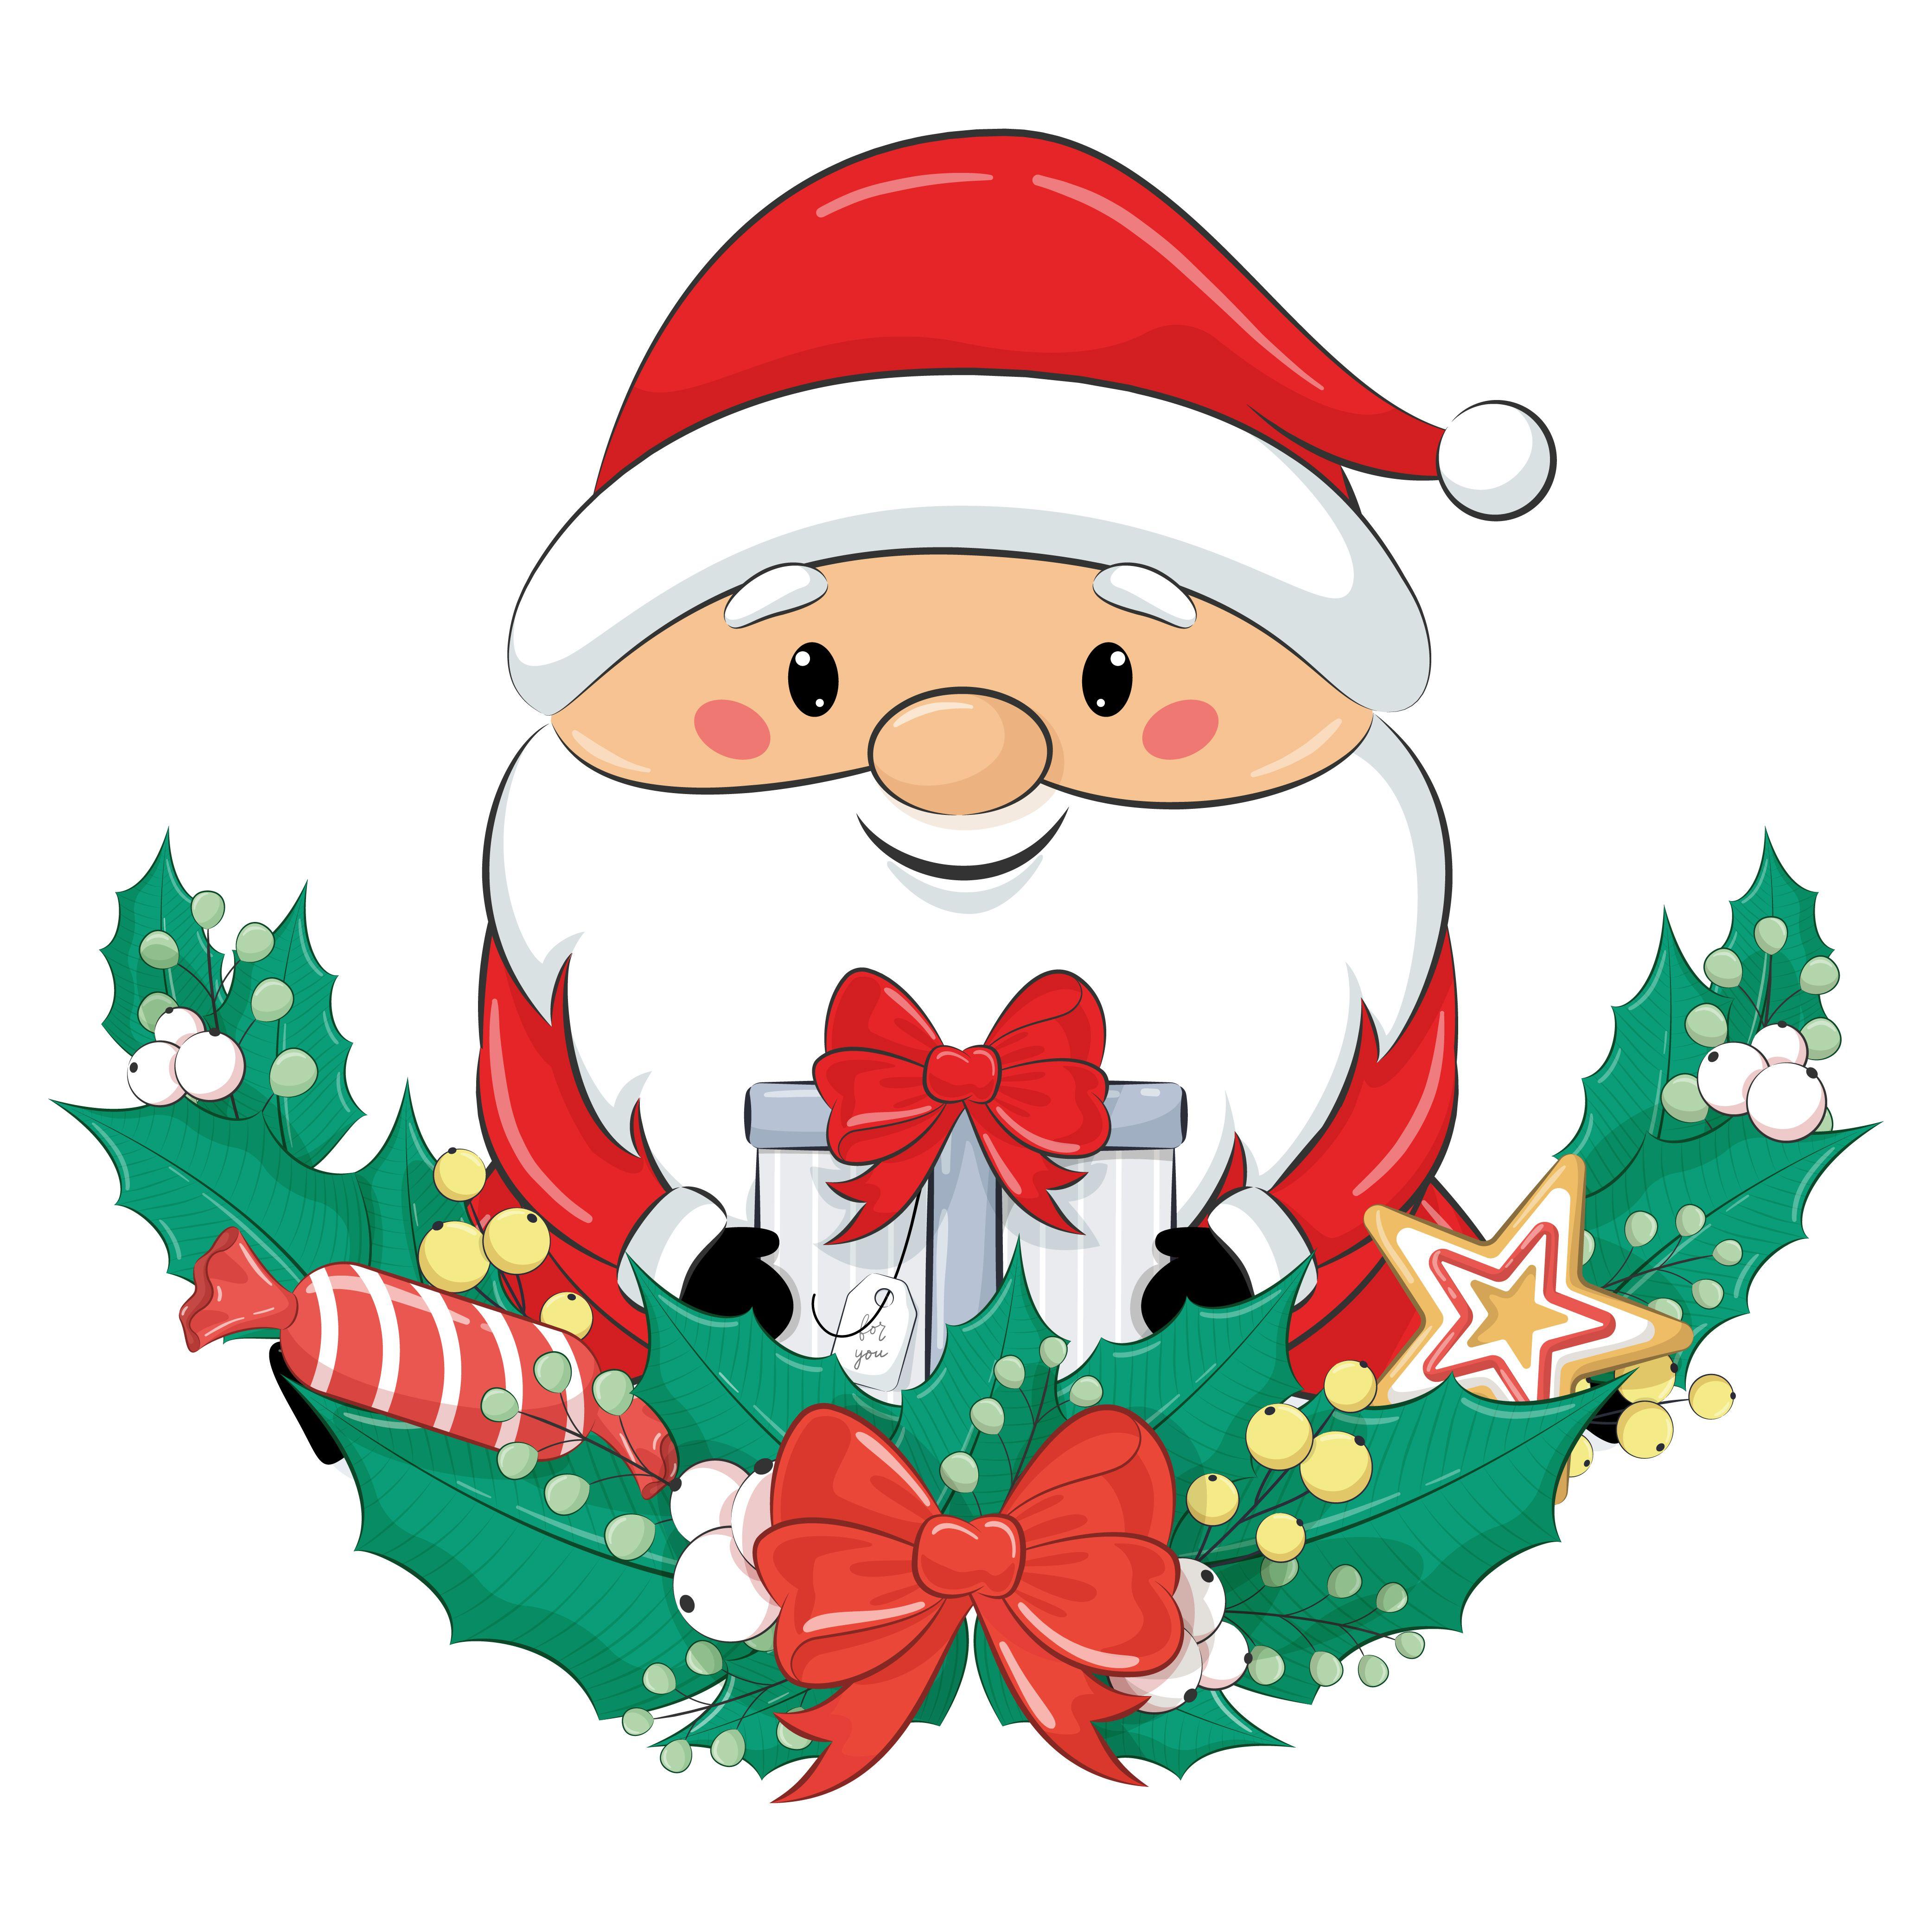 Christmas Clipart Cute Santa Clip Art Png Eps Jpeg Digital Download Christmas Drawing Christmas Art Christmas Clipart